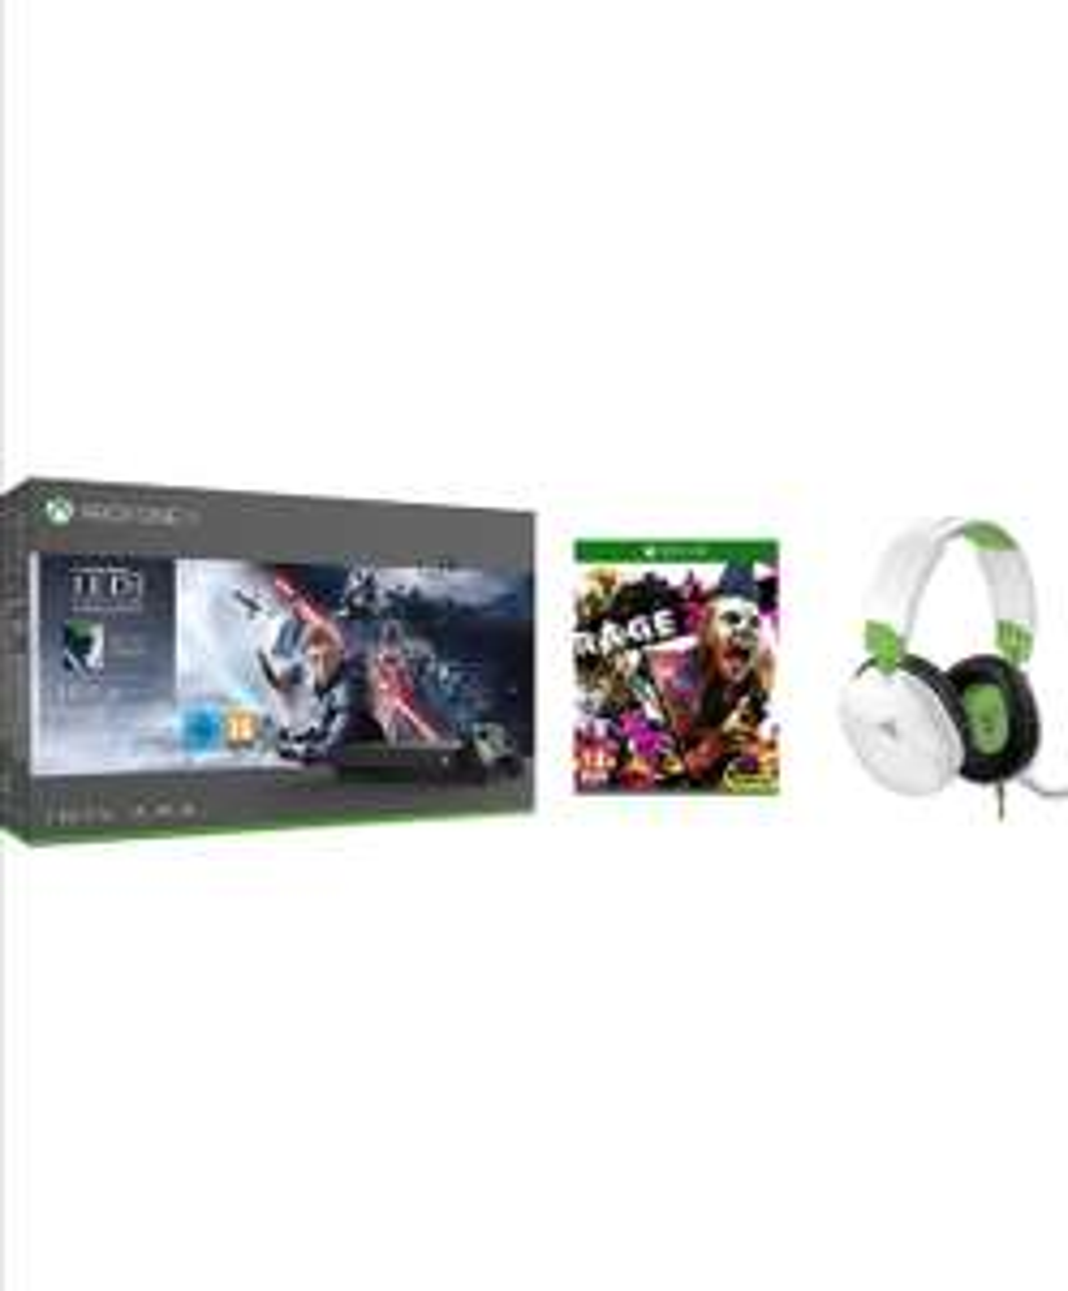 Xbox One X Console - Star Wars Jedi: Fallen Order + Rage 2 + Turtle Beach Recon 70X White Gaming Headset - £319.99 Delivered @ Amazon